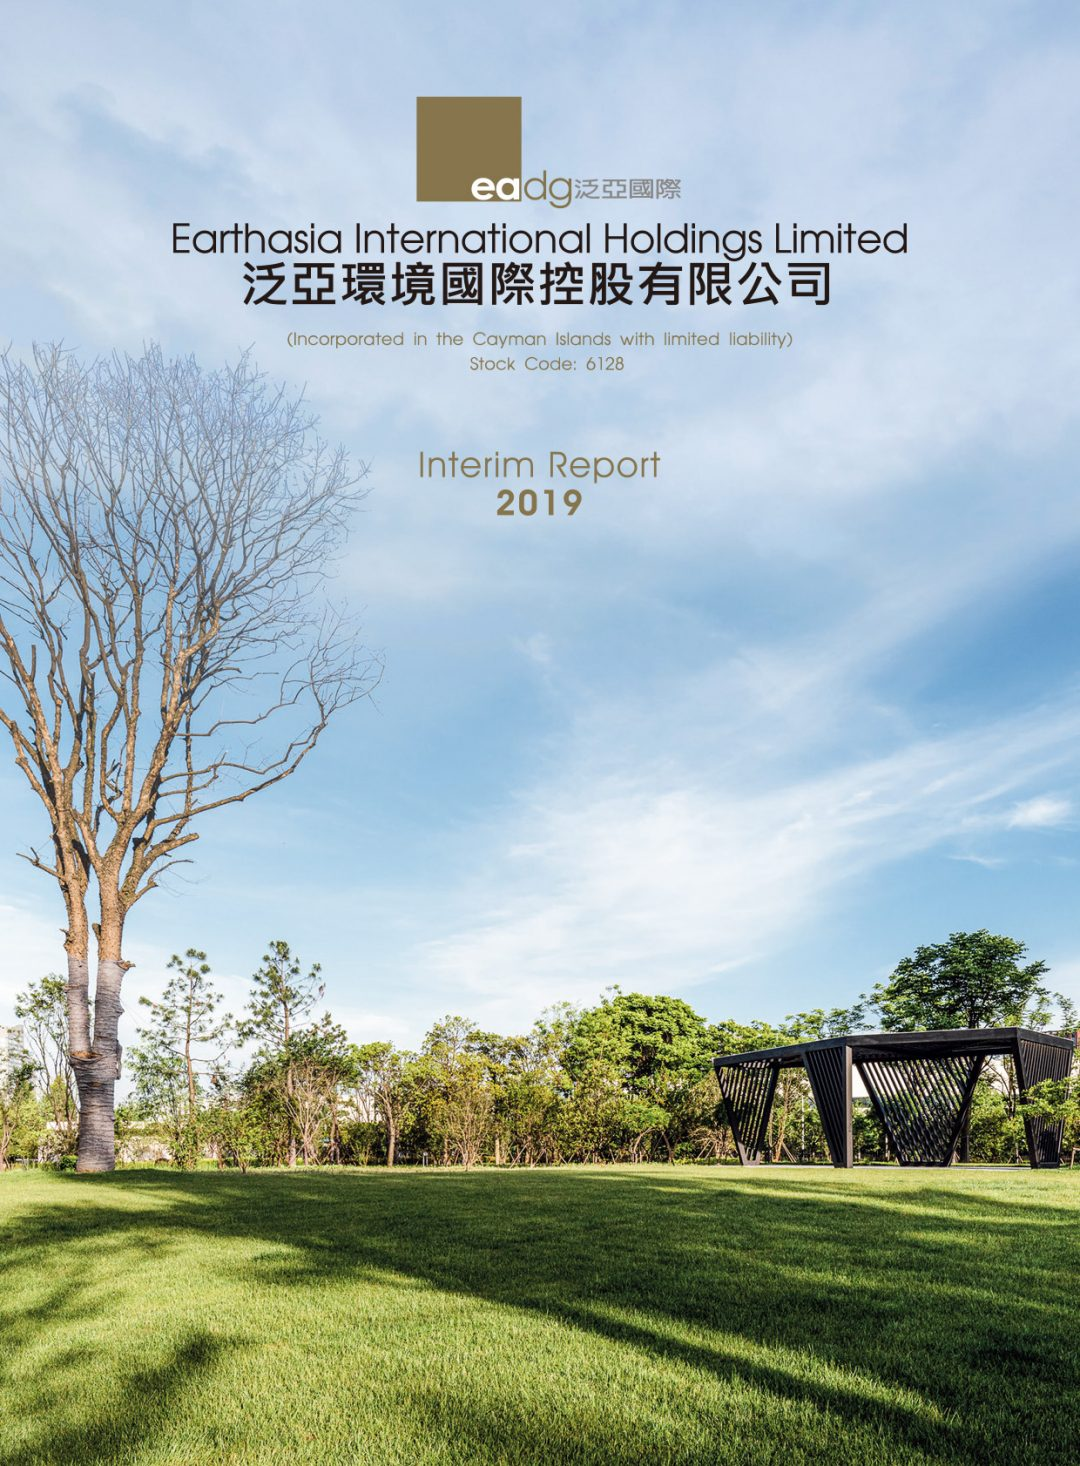 Earthasia International Holdings Limited